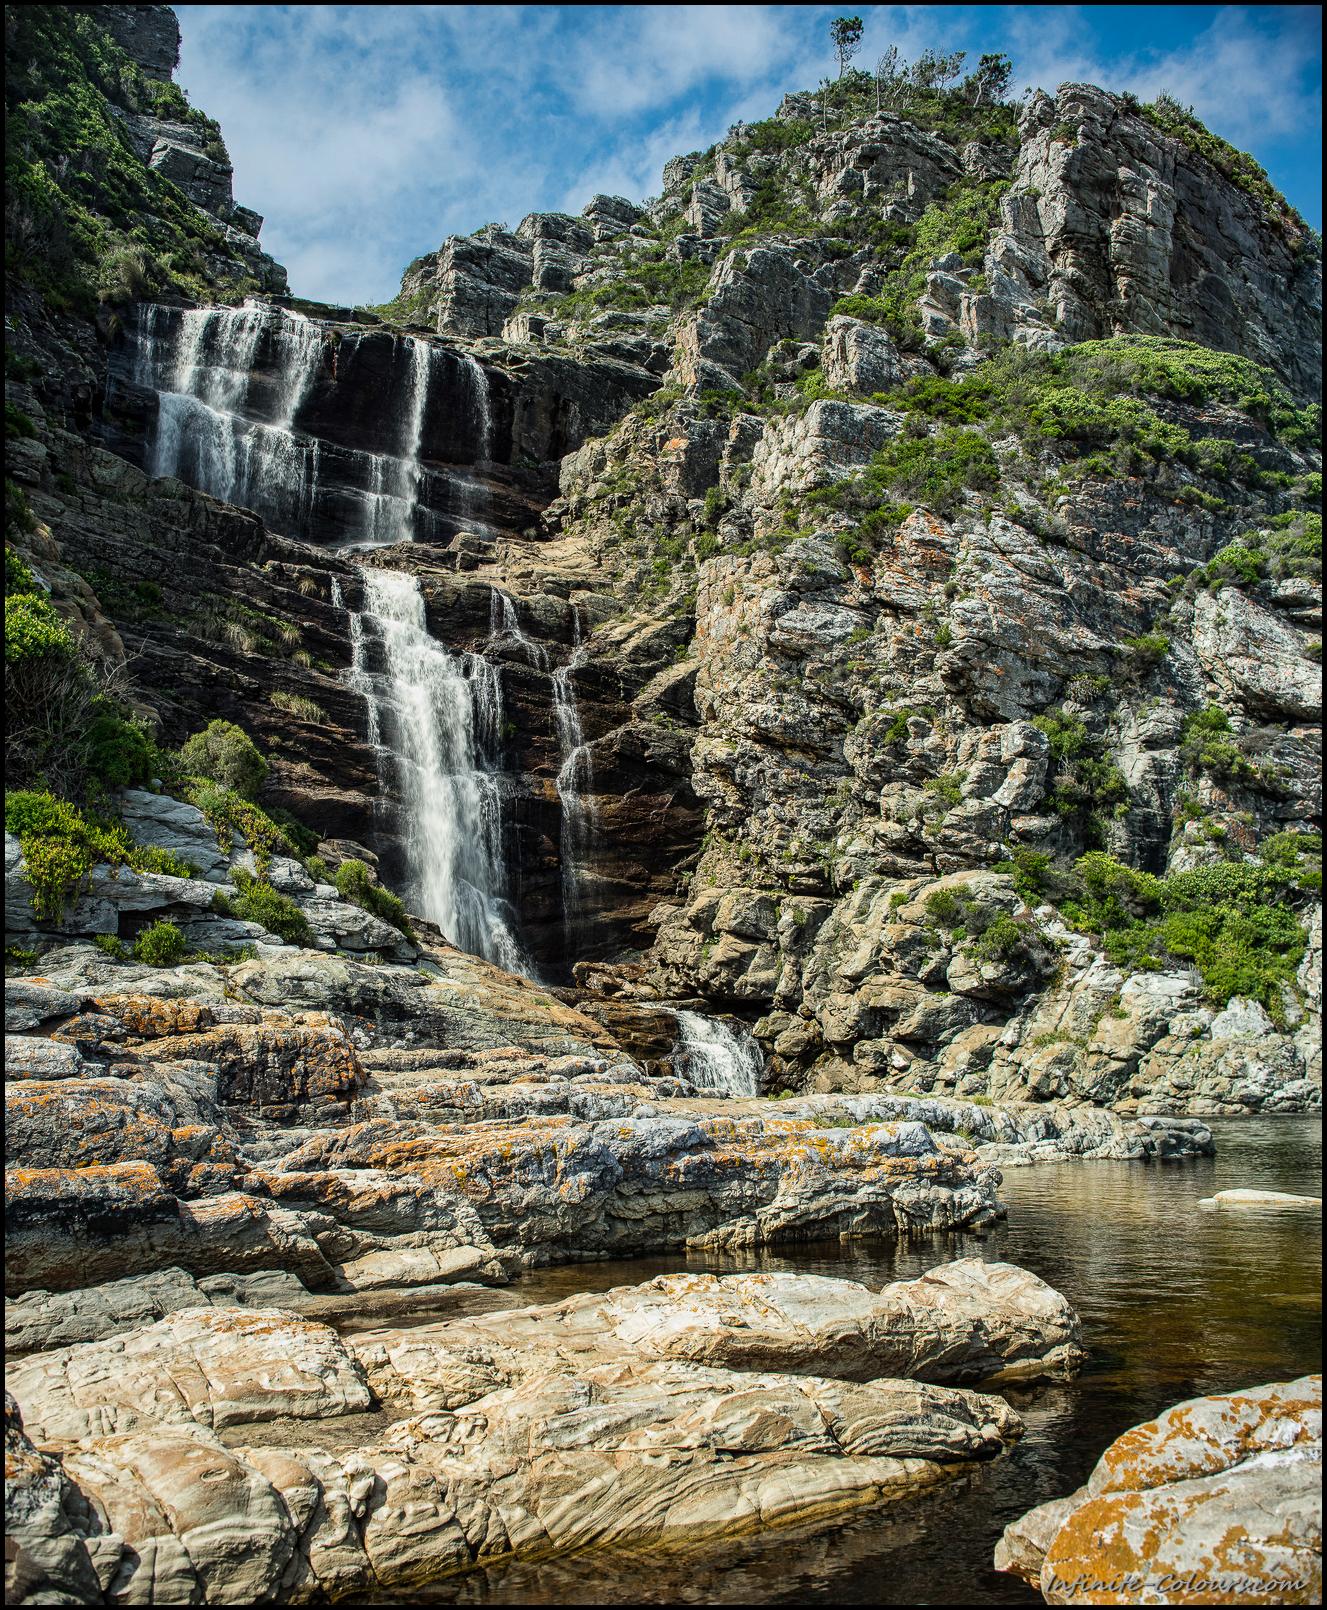 Jerling Rivier cascades on Otter Trail